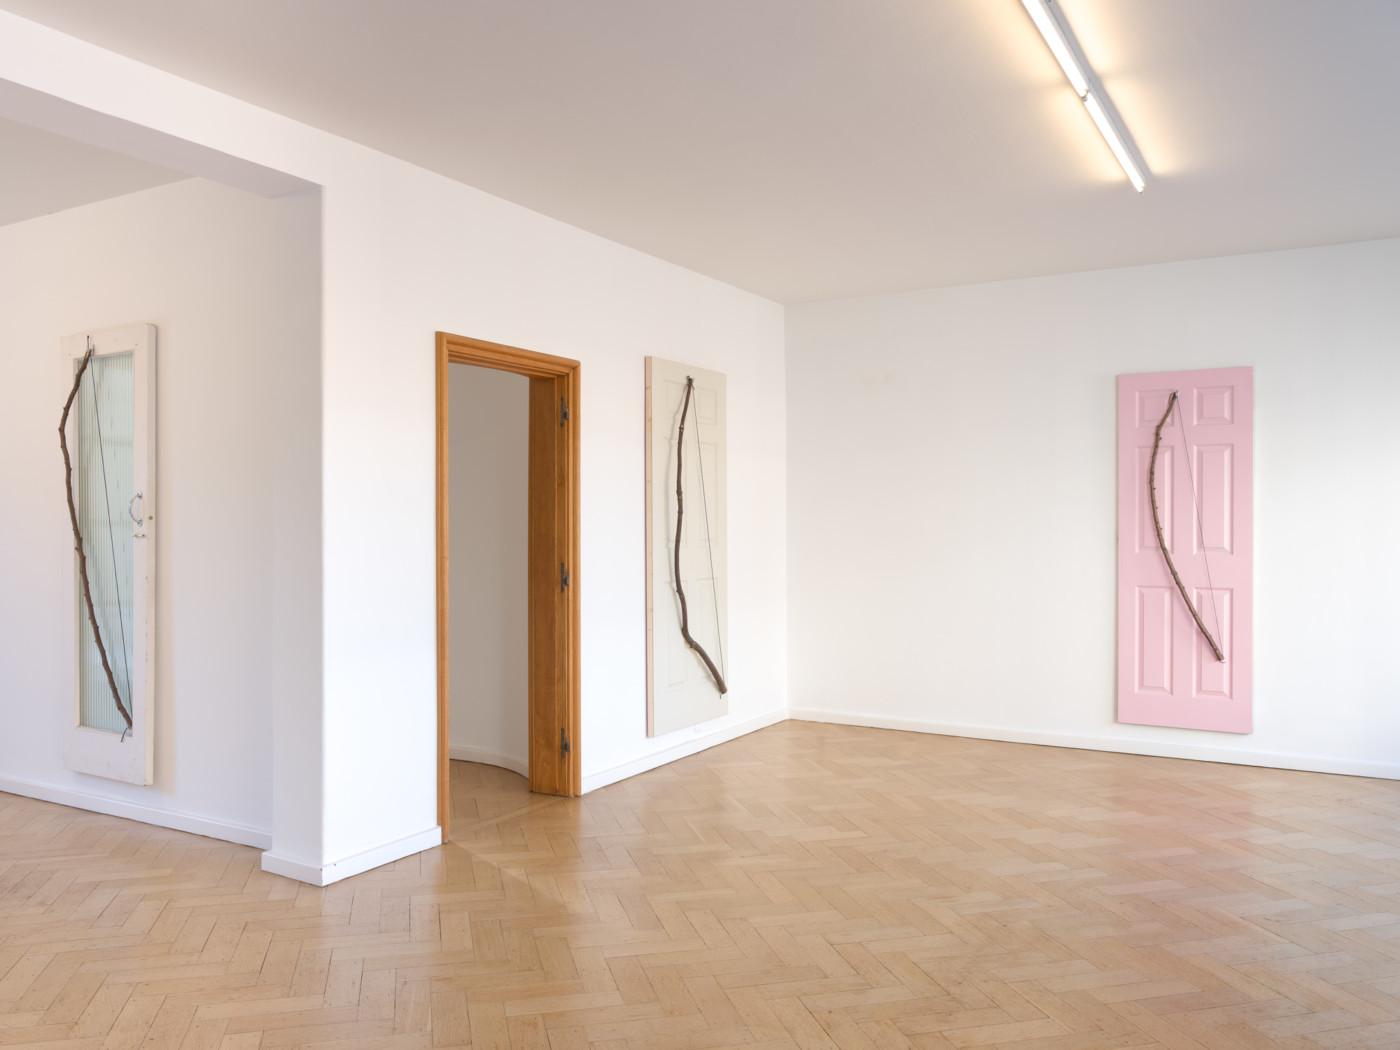 KEITH FARQUHAR  Barbecue 2,  2021, Office Baroque, Antwerp, Belgium, installation view   - High Art Gallery Paris